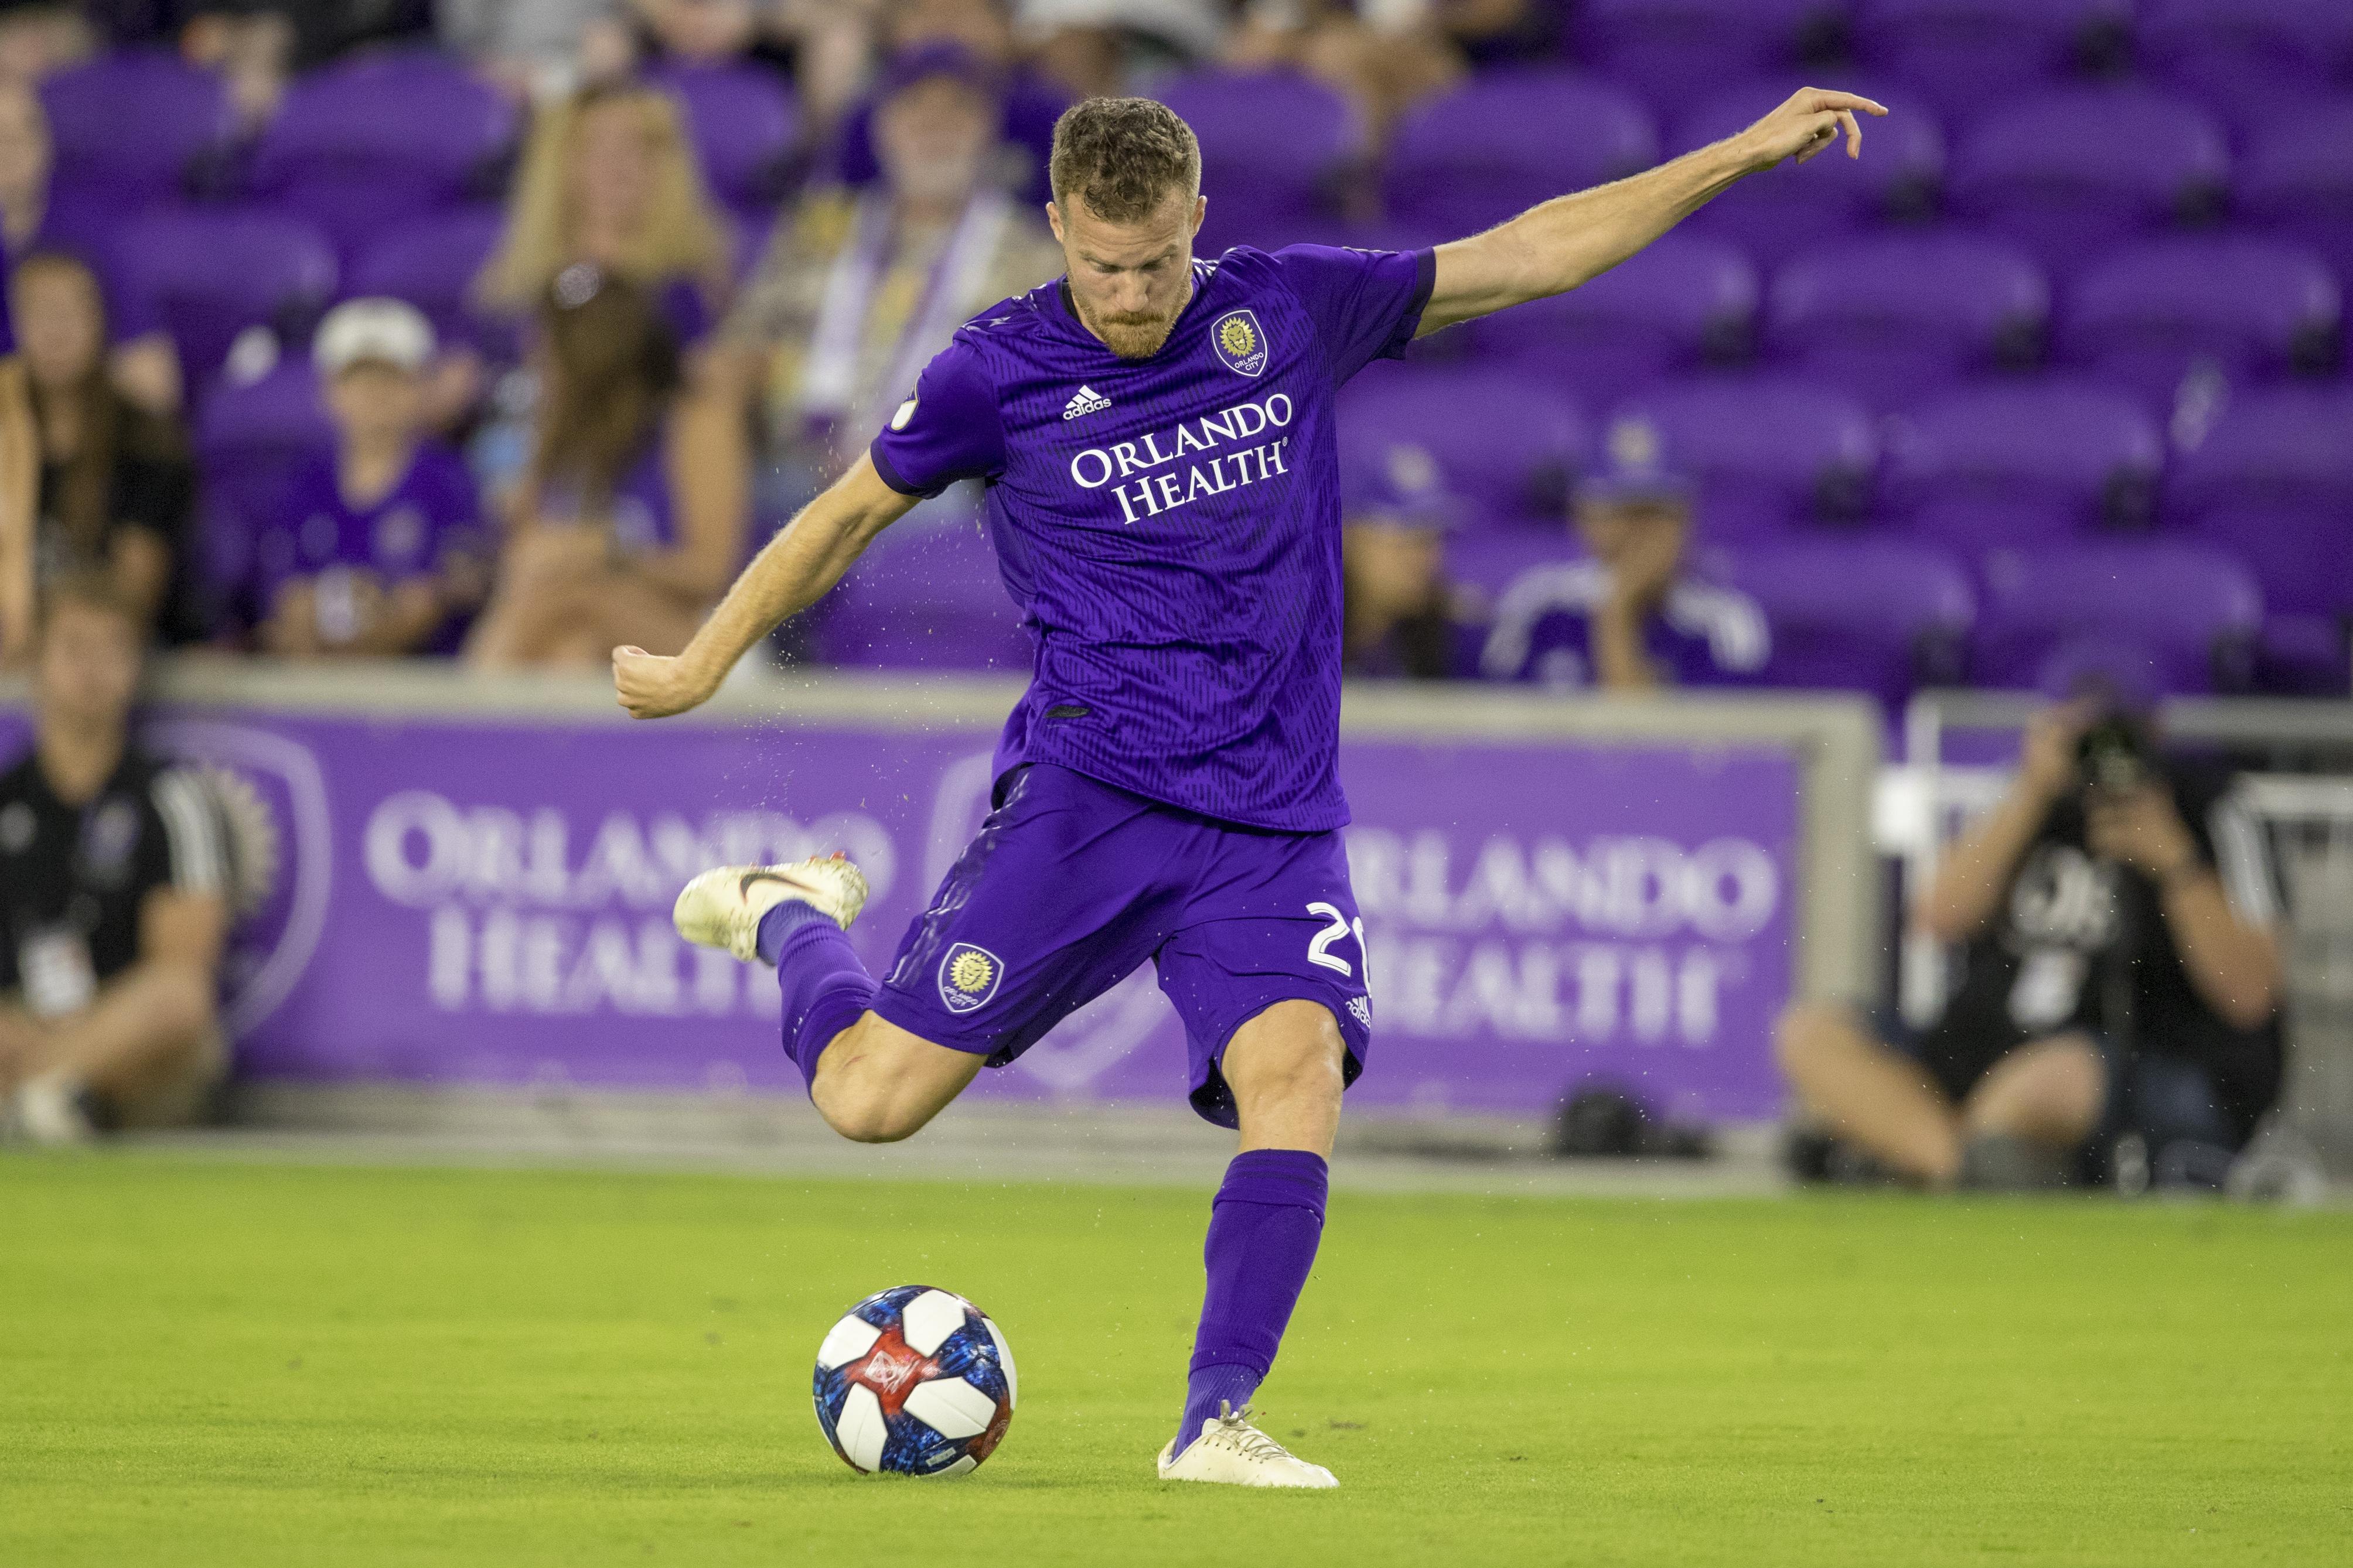 SOCCER: MAR 31 MLS - DC United at Orlando City SC